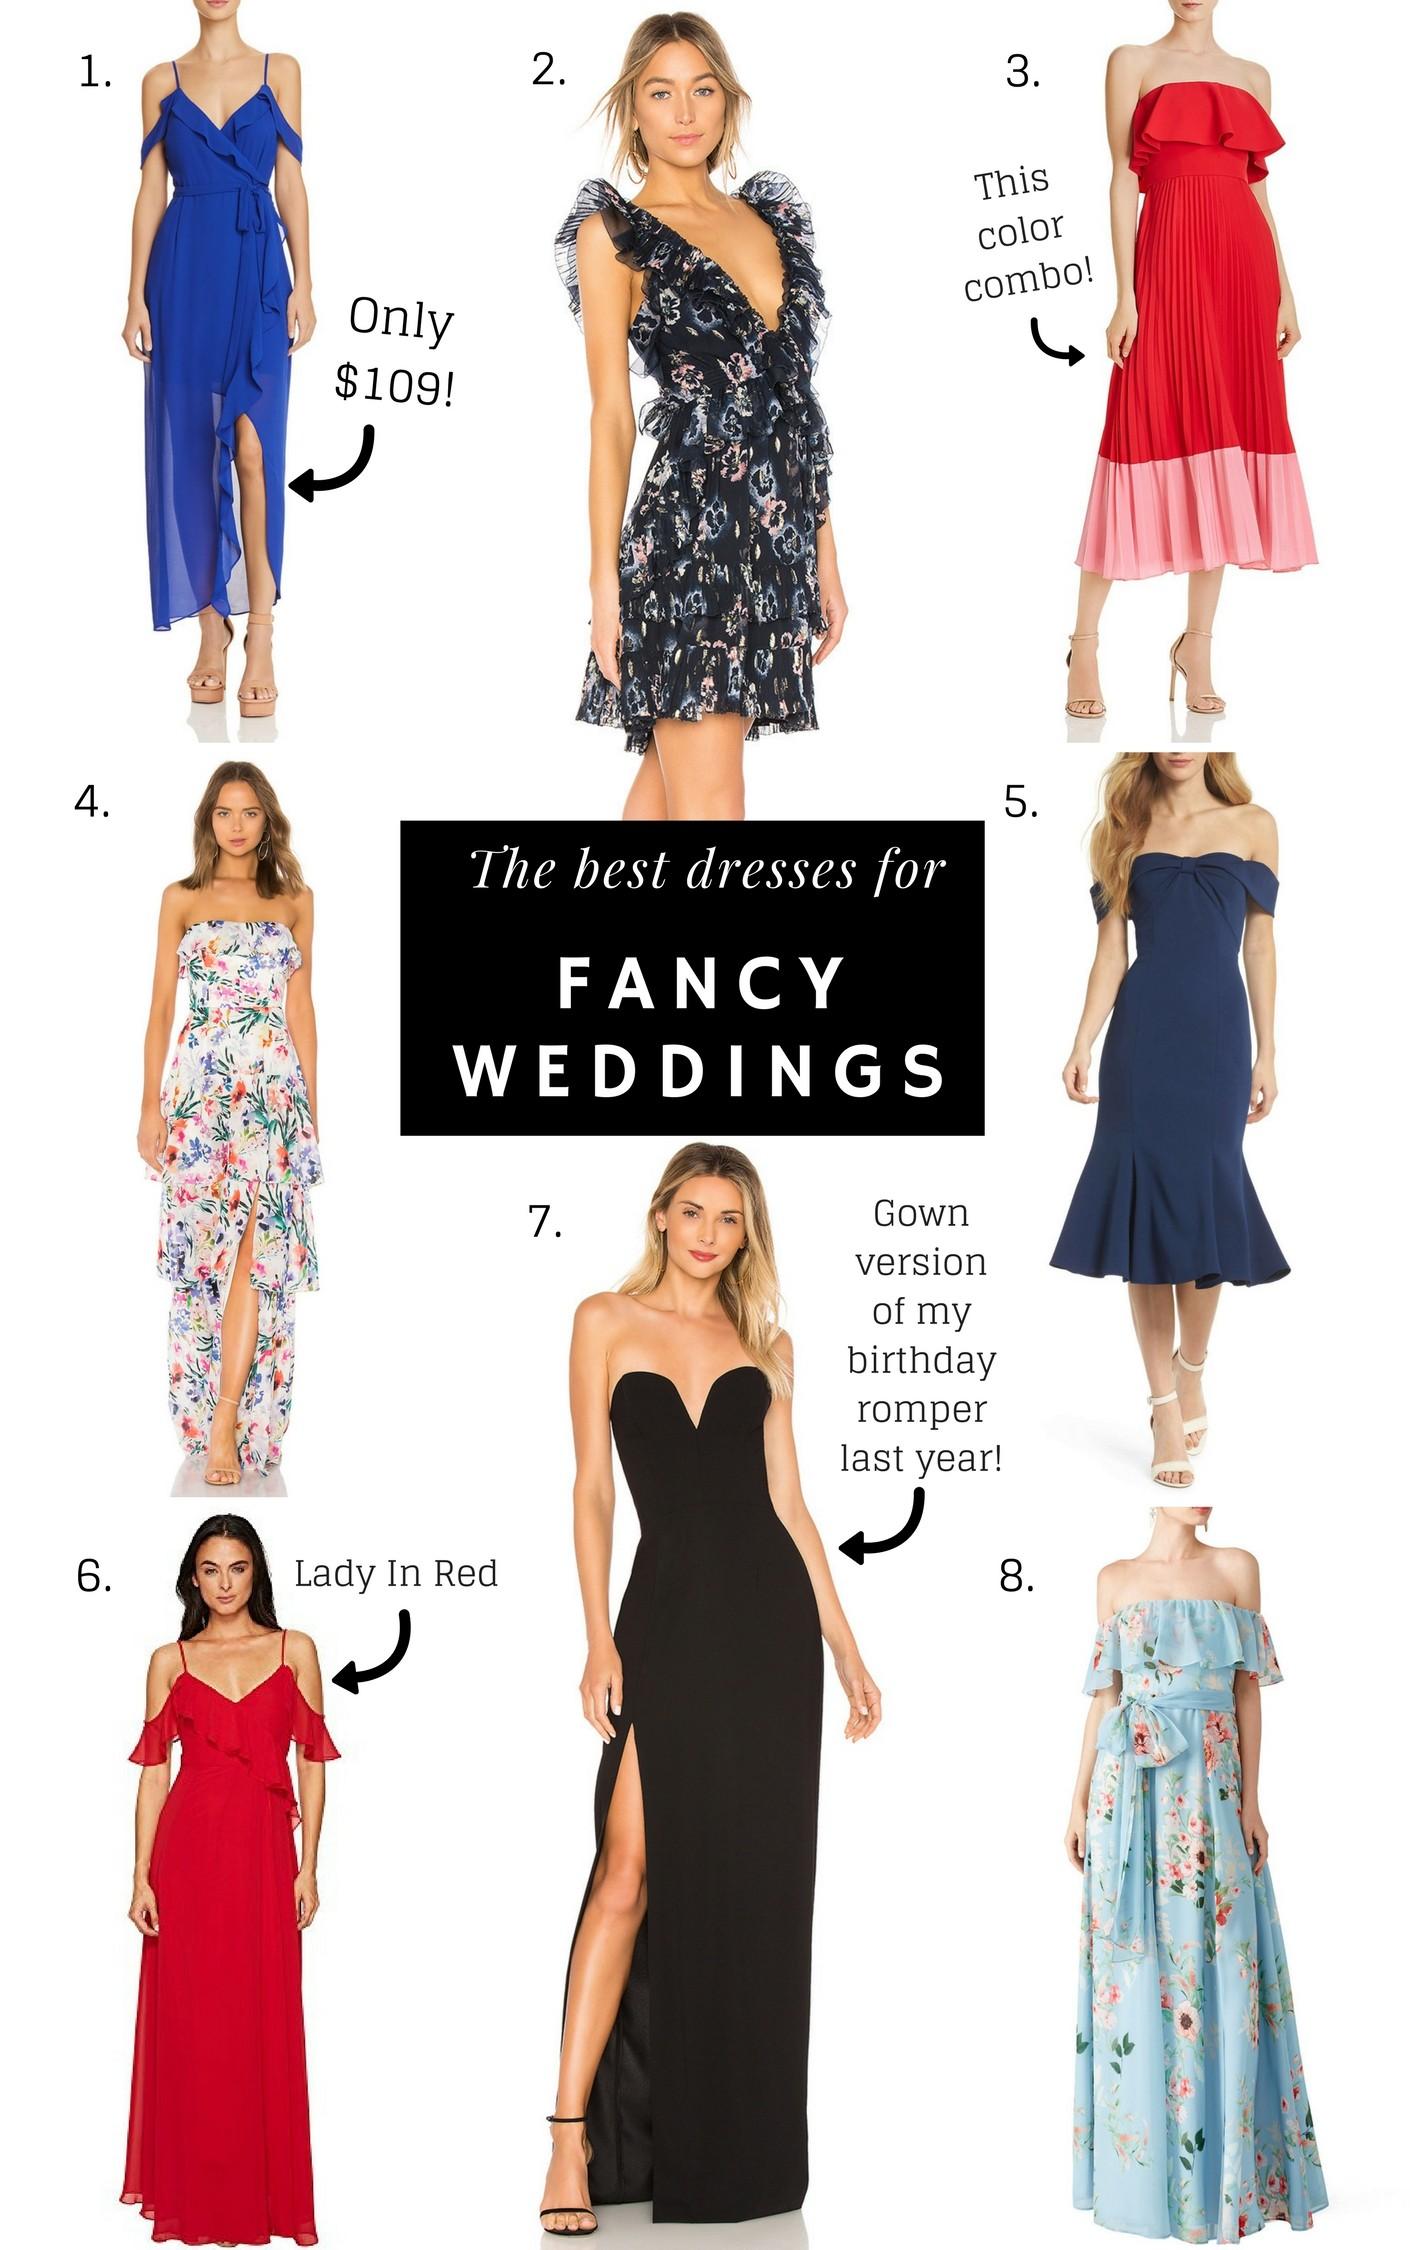 d0b883d4ef0 The Ultimate Wedding Season Dress Guide for 2018 - Lake Shore Lady